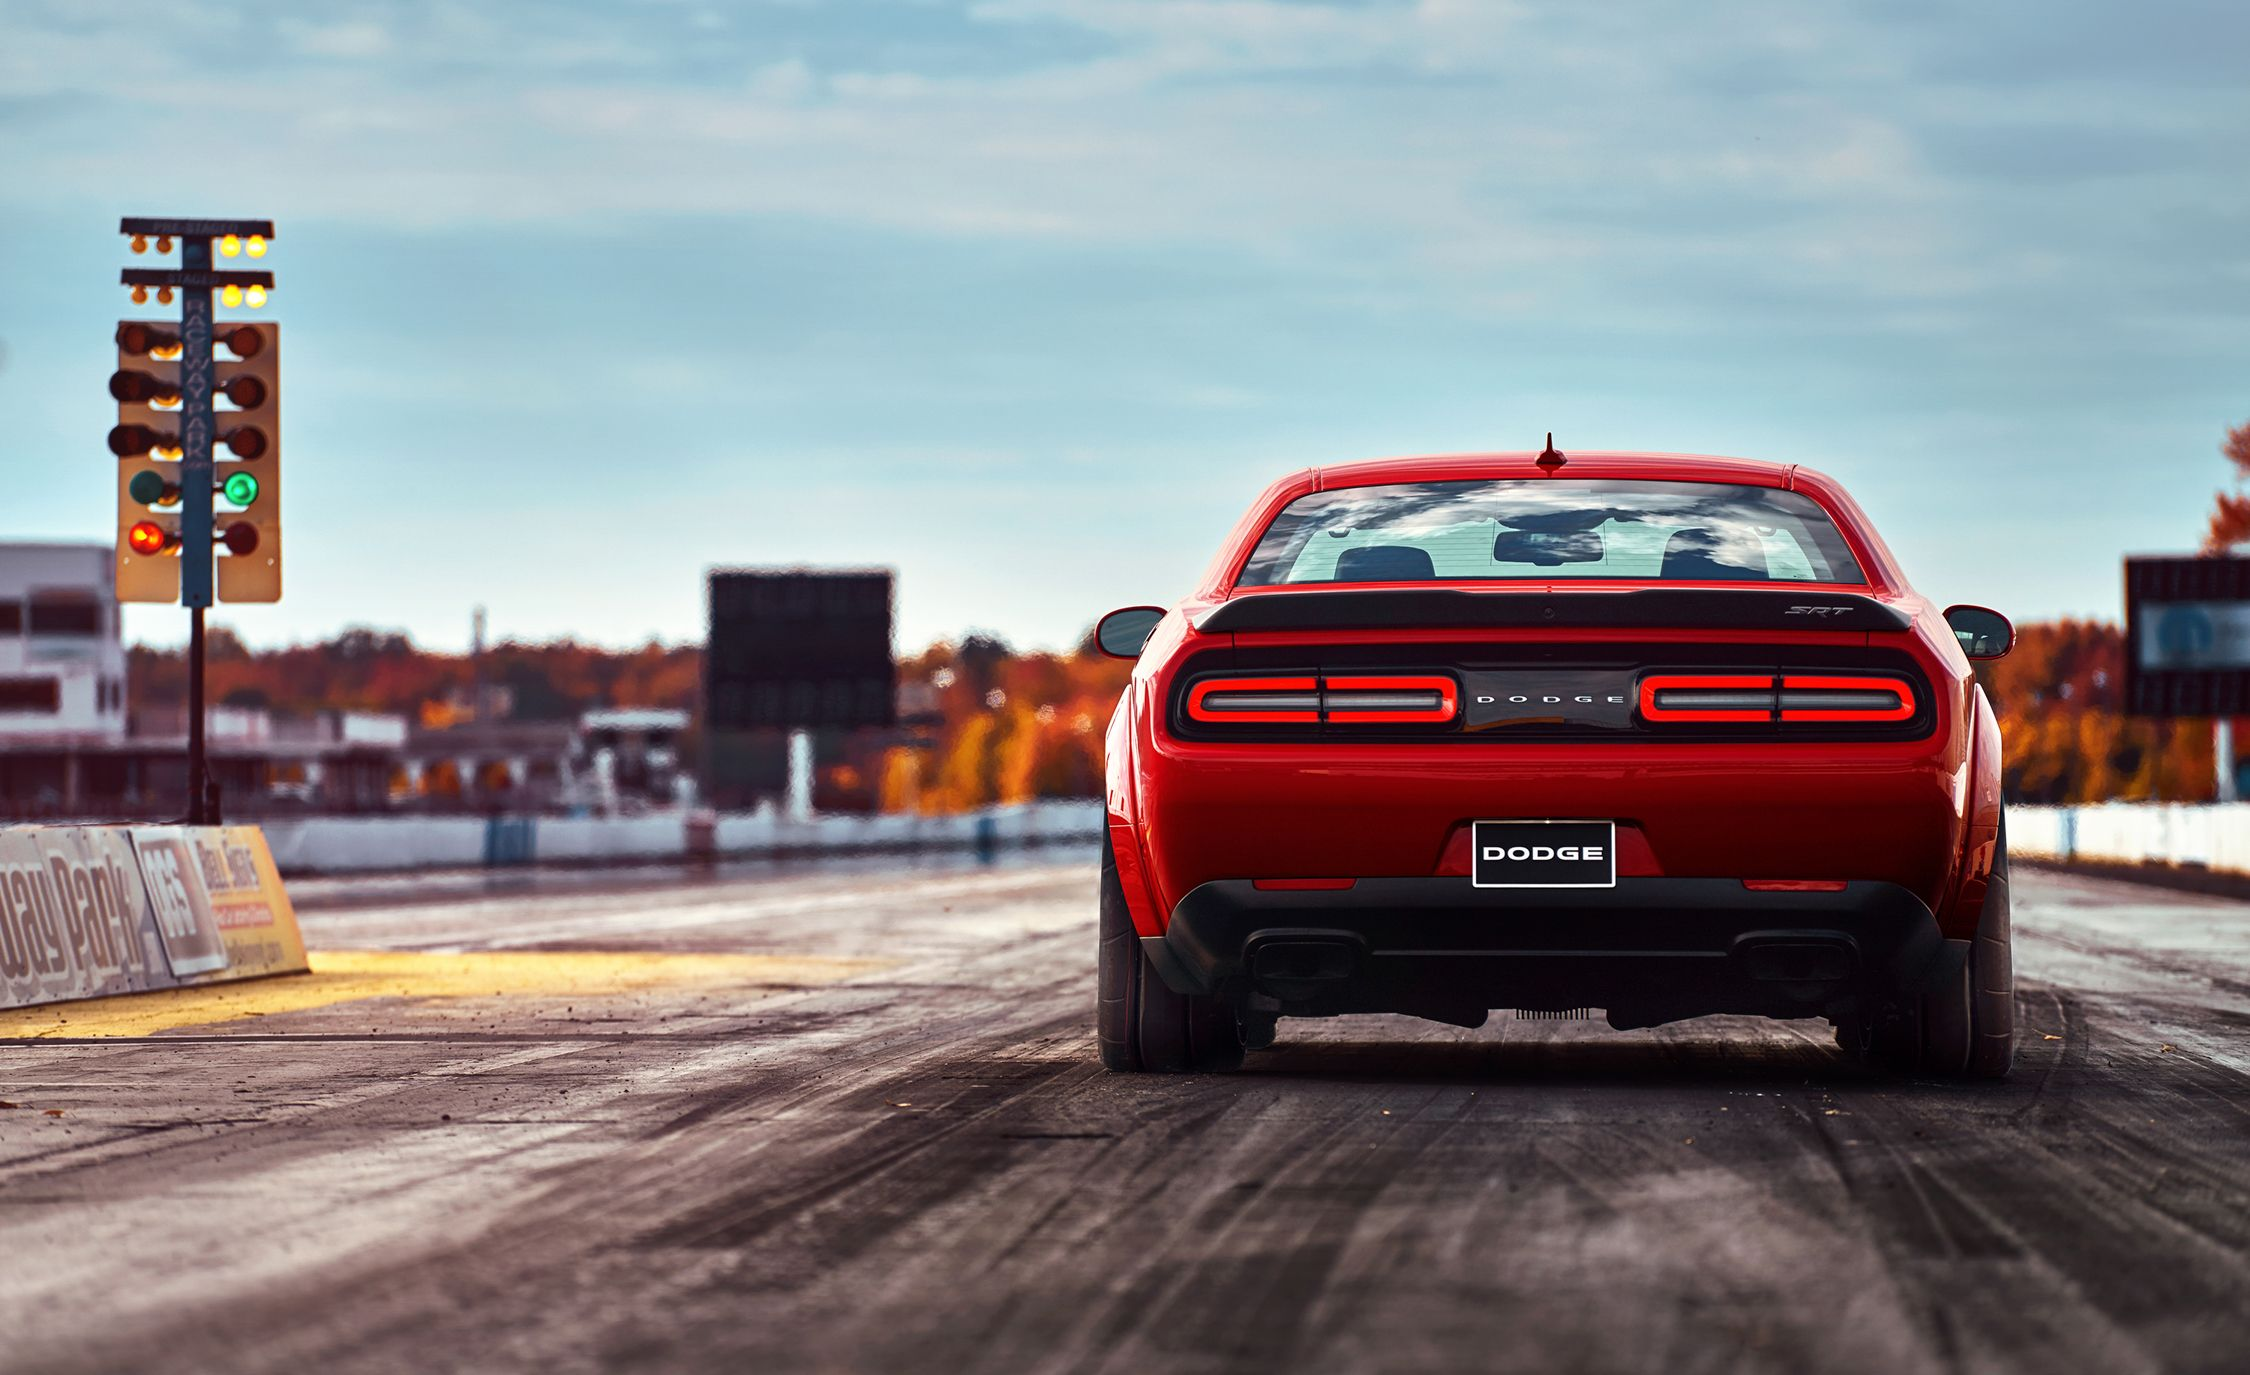 2018 Dodge Challenger Srt Demon Reviews Dodge Challenger Srt Demon